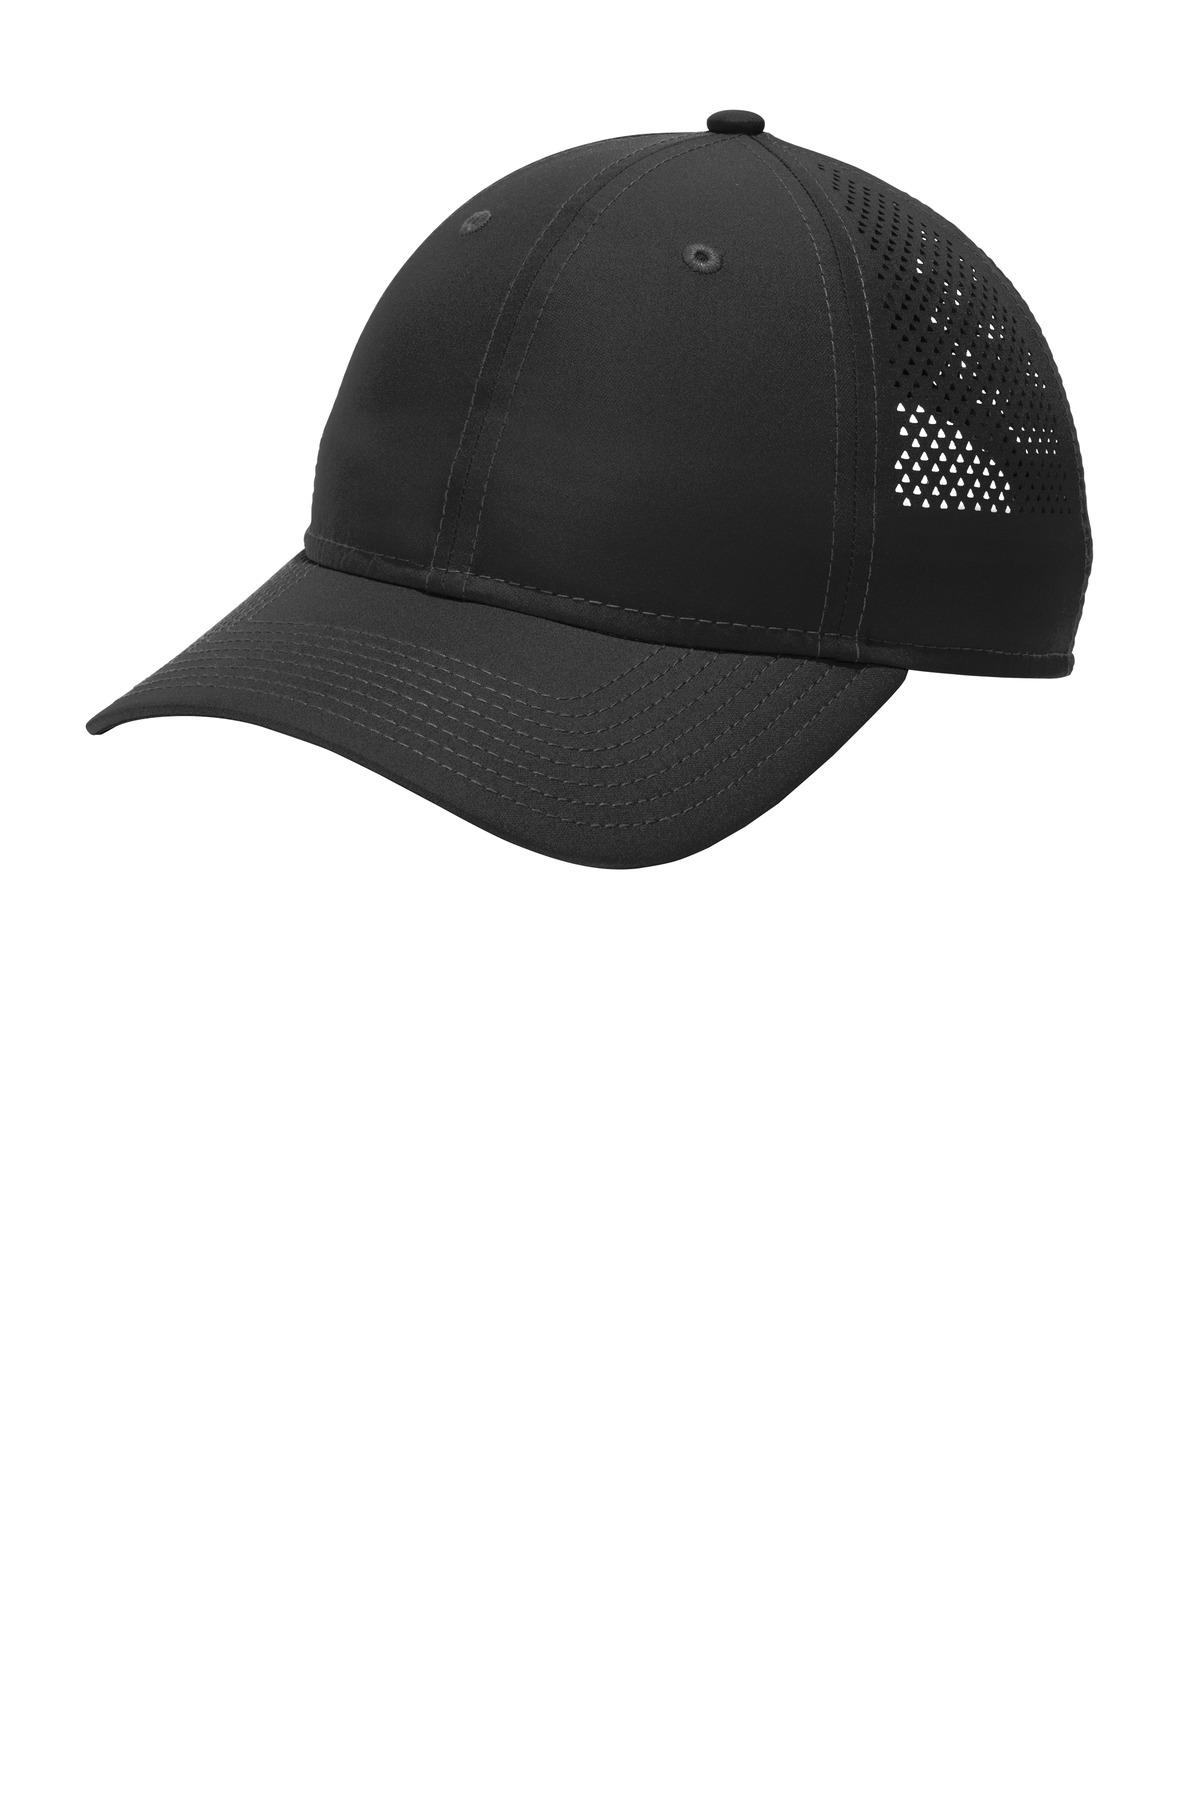 big sale 97368 eaef2 New Era ® Perforated Performance Cap. NE406Caps, Performance  Athletic